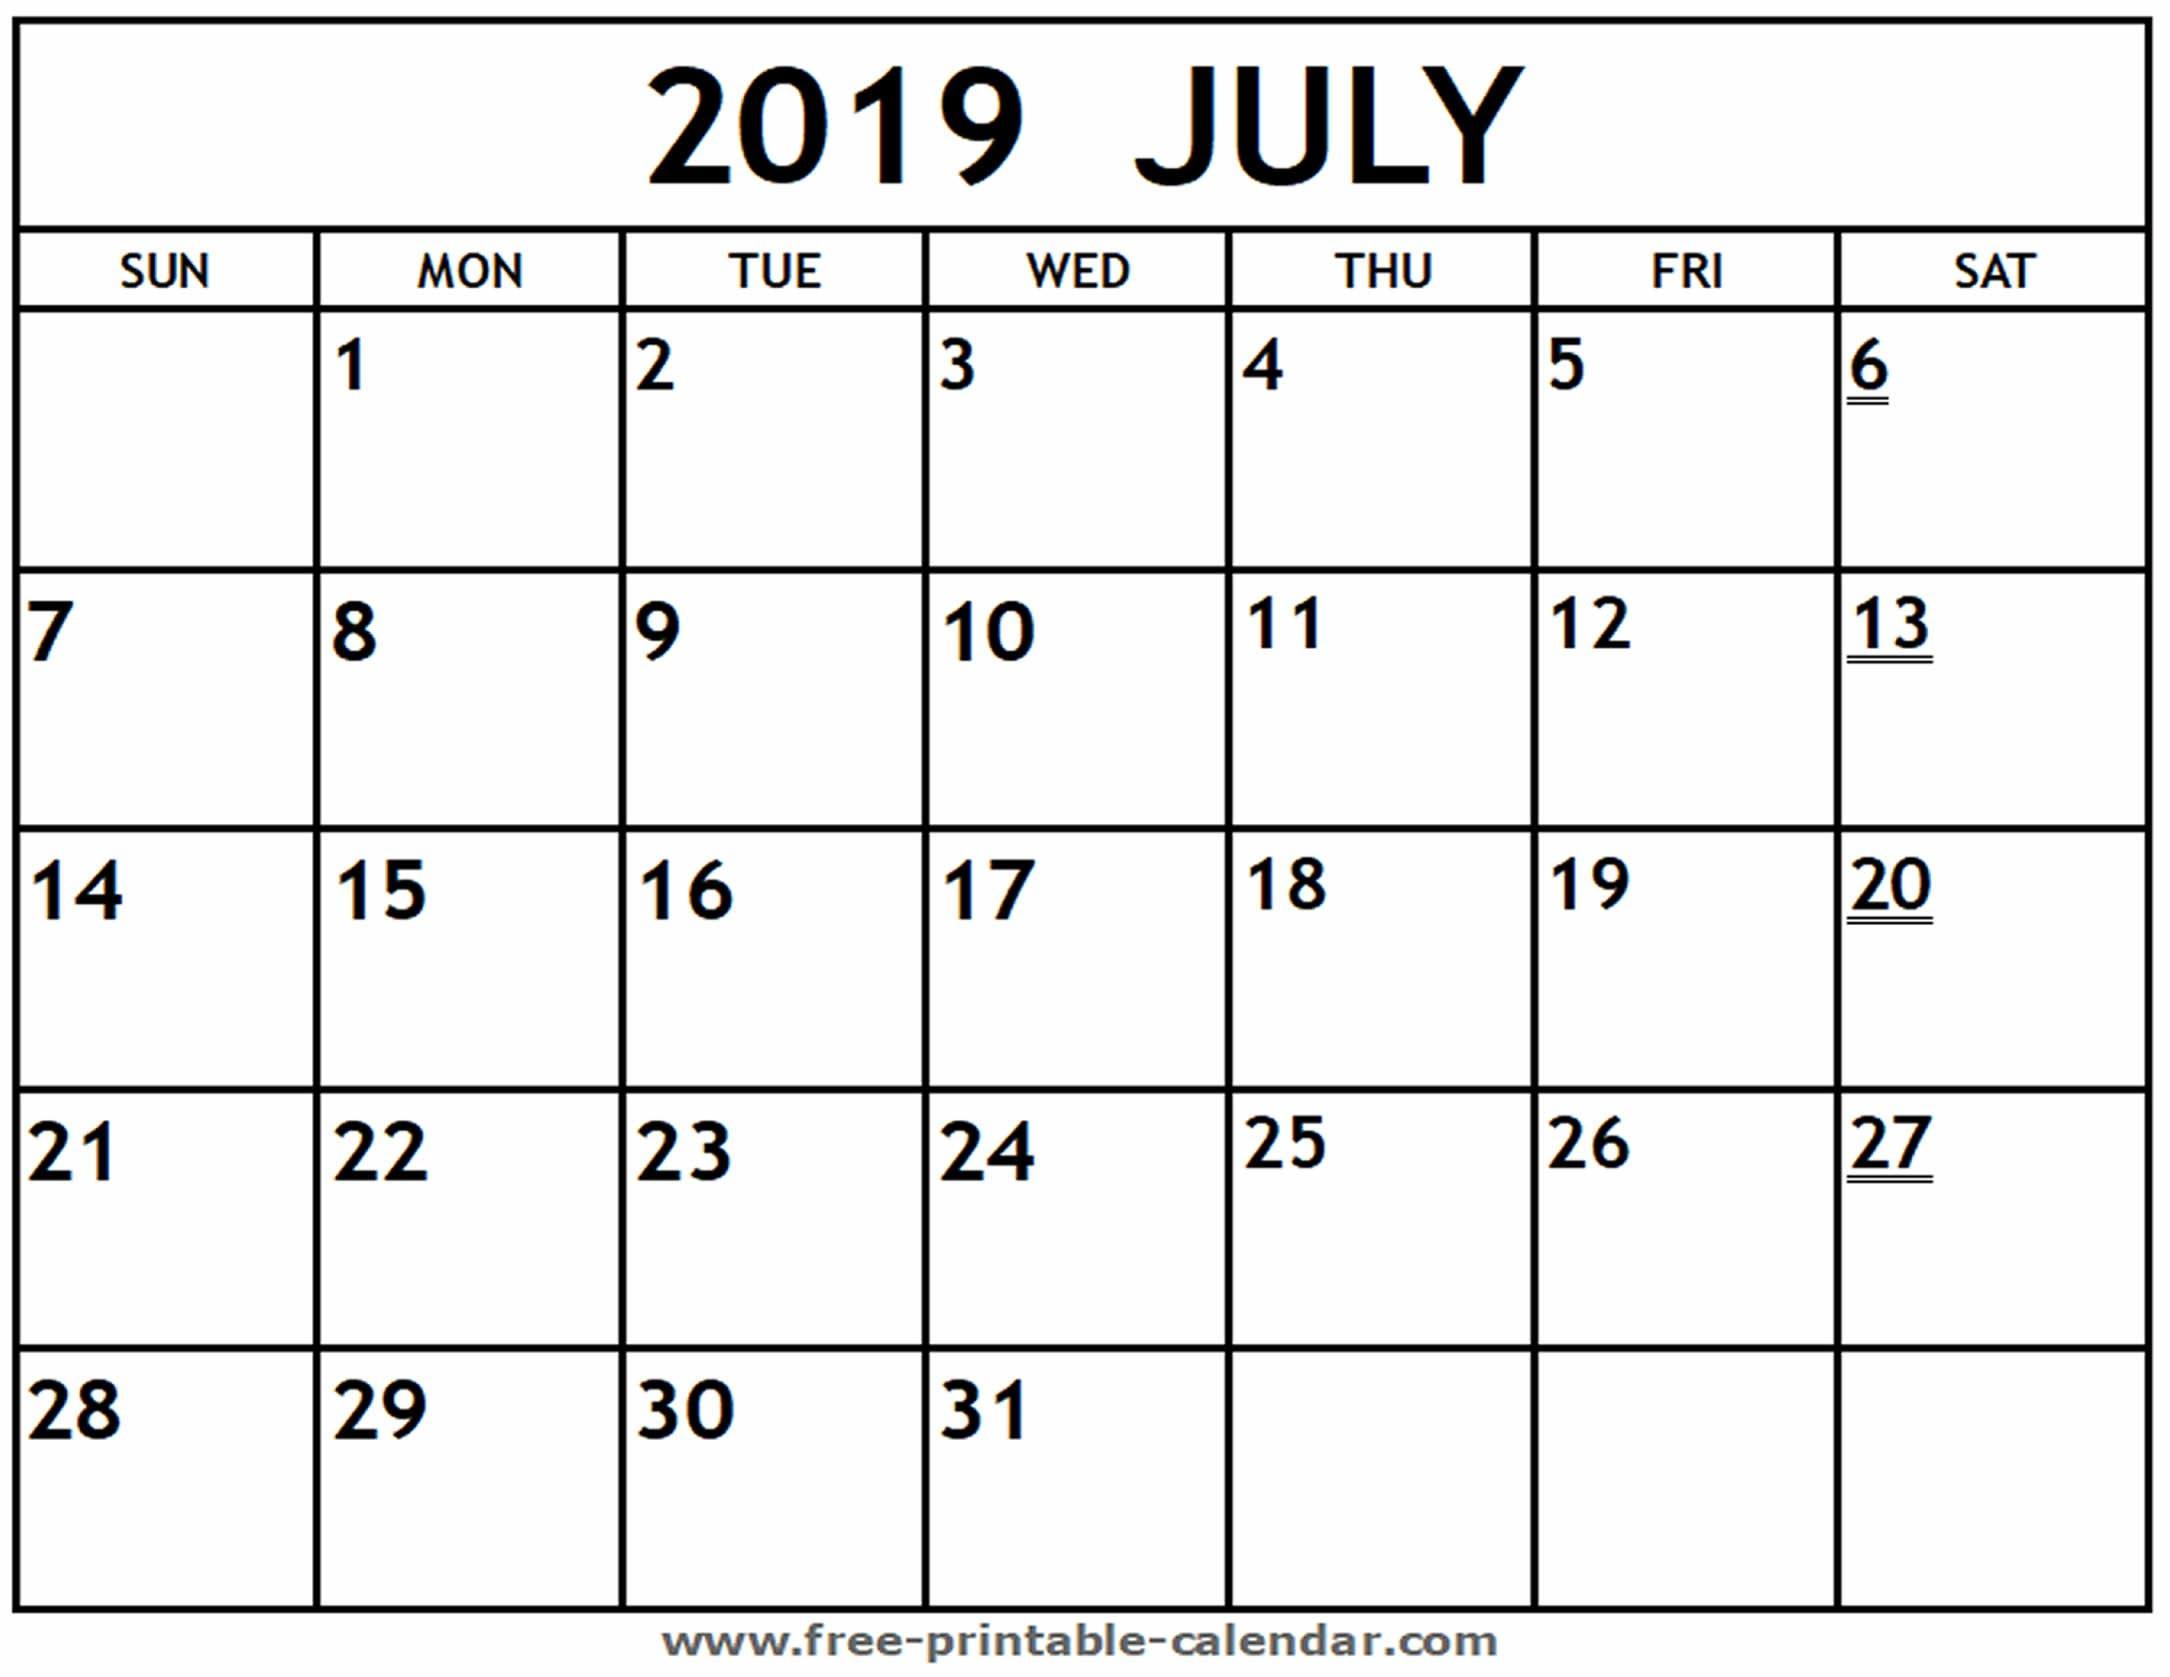 Printable 2019 July Calendar - Free-Printable-Calendar Calendar 2019 July